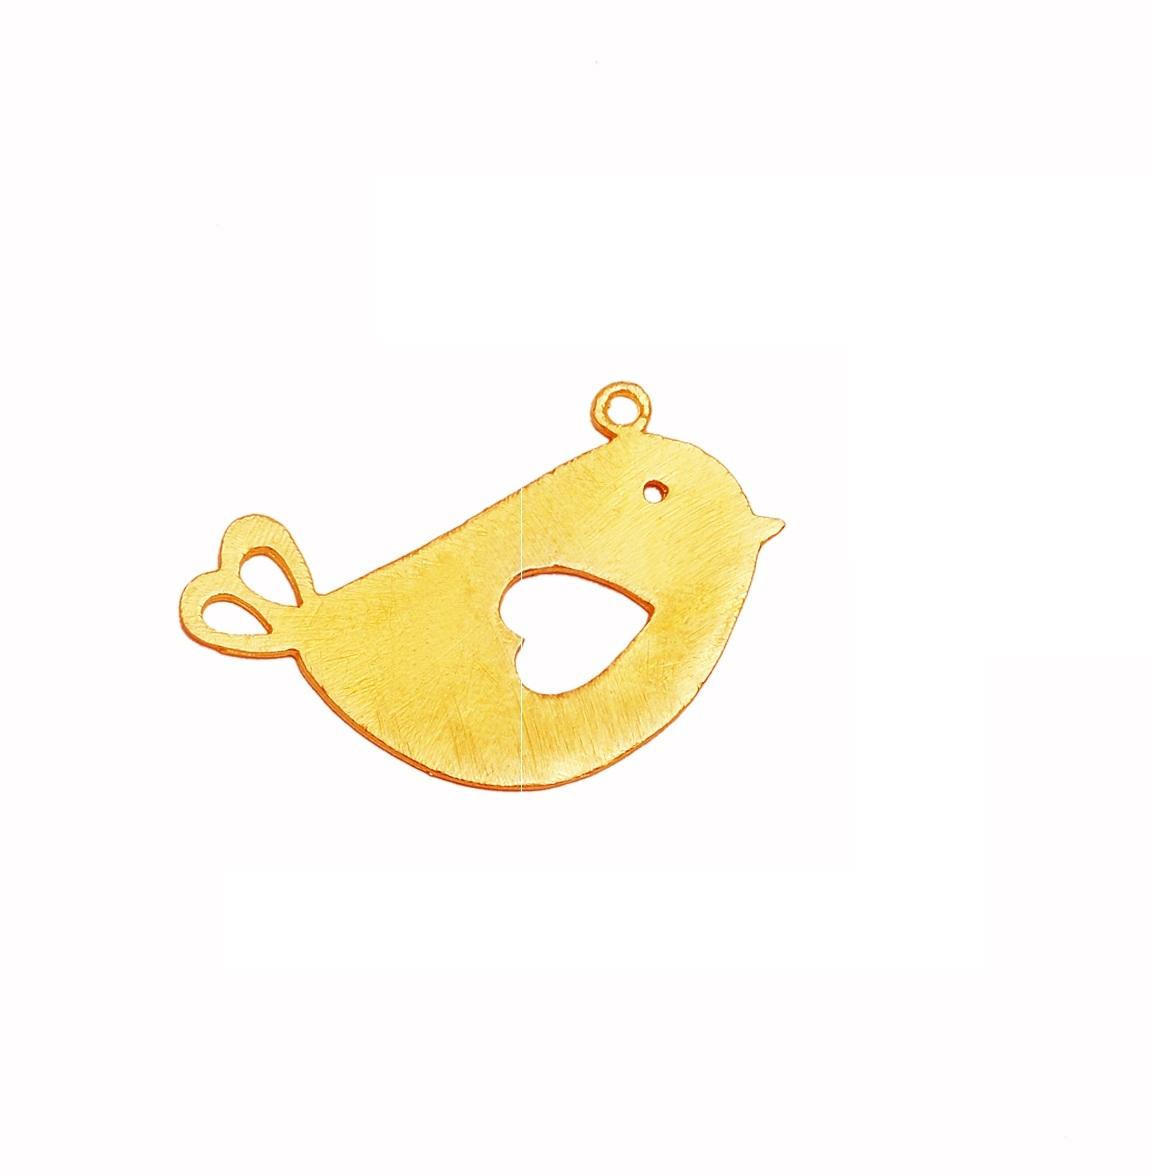 Handmade Gold Plated Temple Bell Metal Charm Pendant - Fancy Bell Shape Pendant